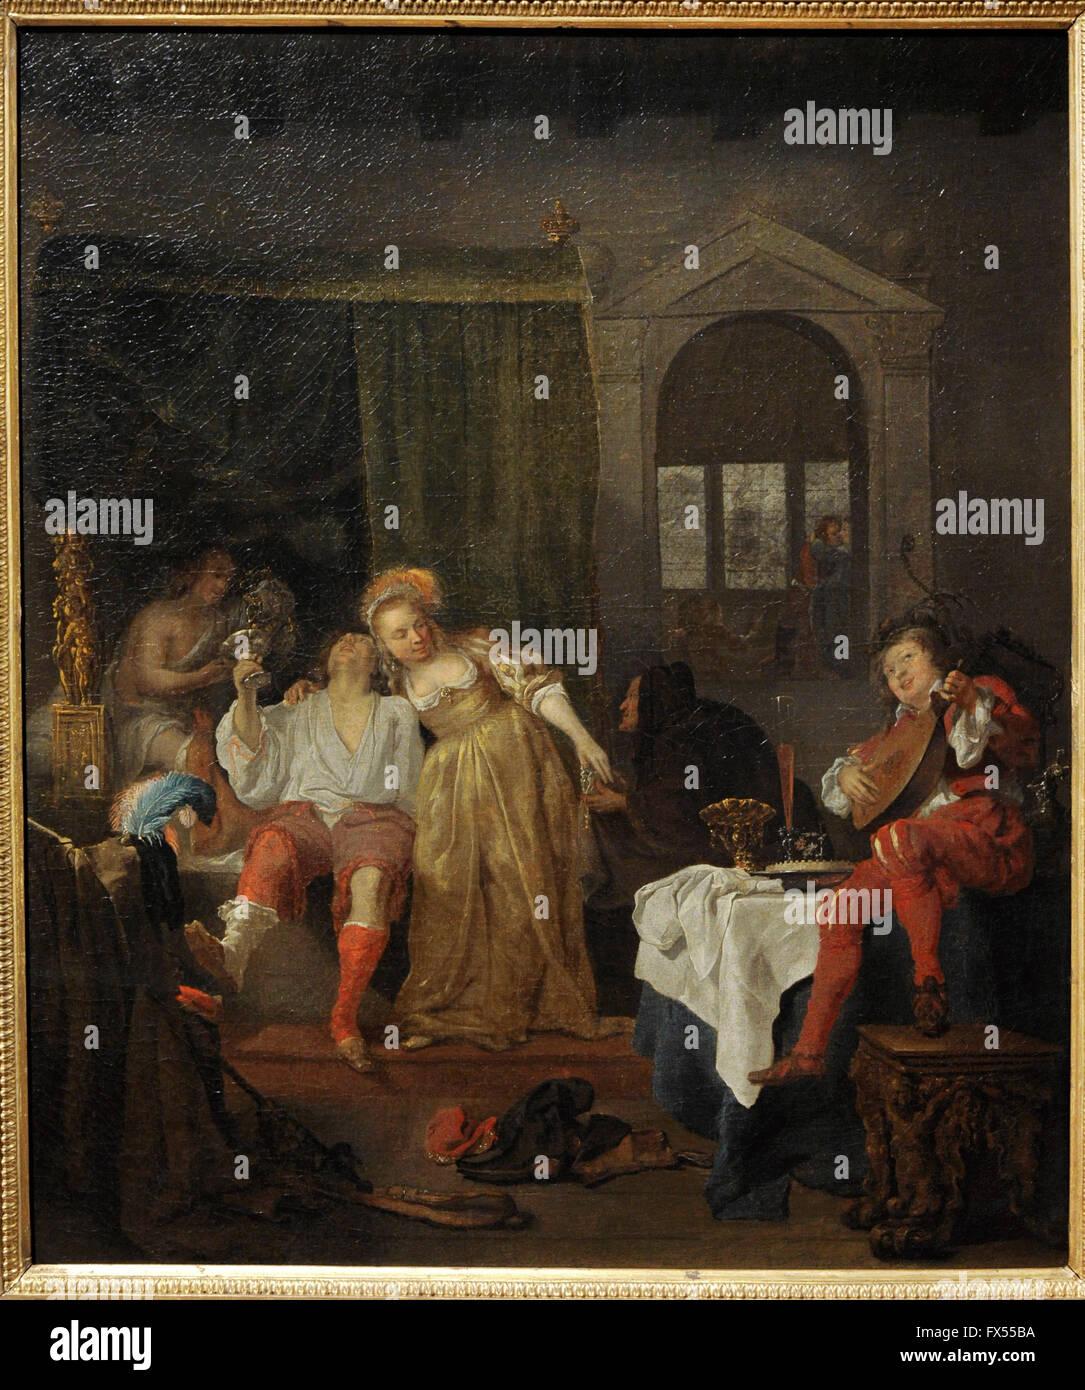 Gabriel Metsu (1629-1667). Dutch painter. Prodigal Son, 1640s. The State Hermitage Museum. Saint Petersburg. Russia. - Stock Image